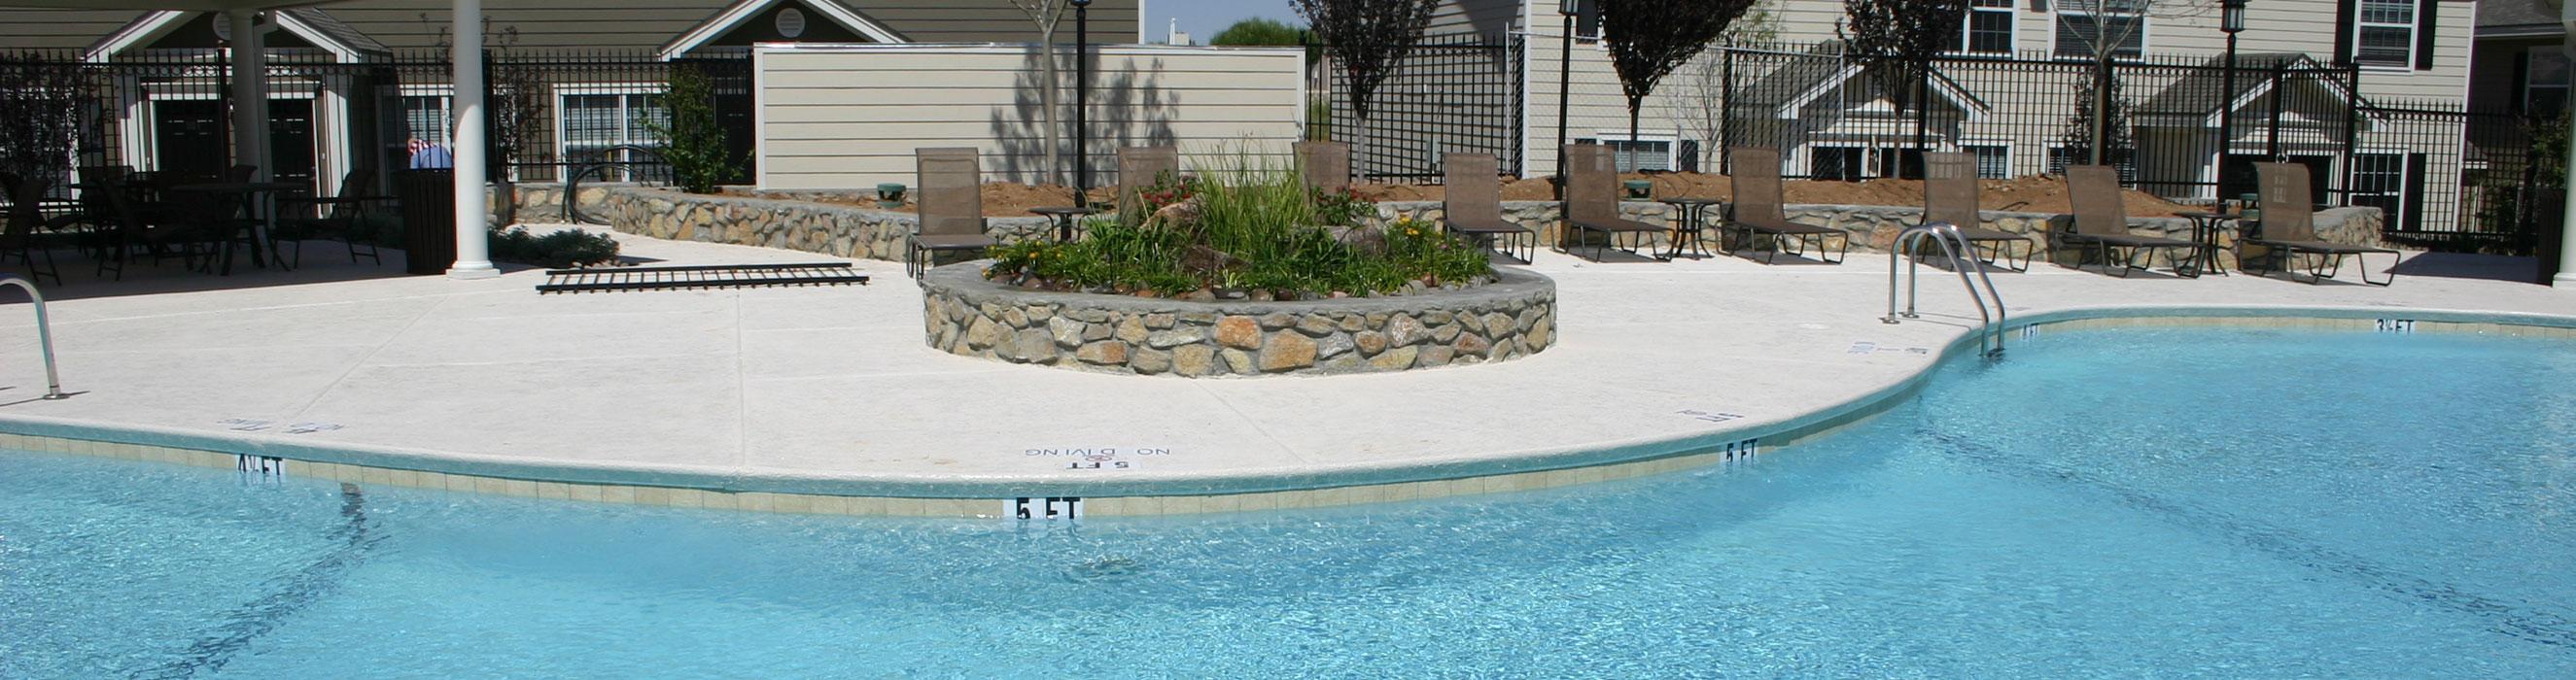 Swimming Pool Builder Swimming Pool Construction El